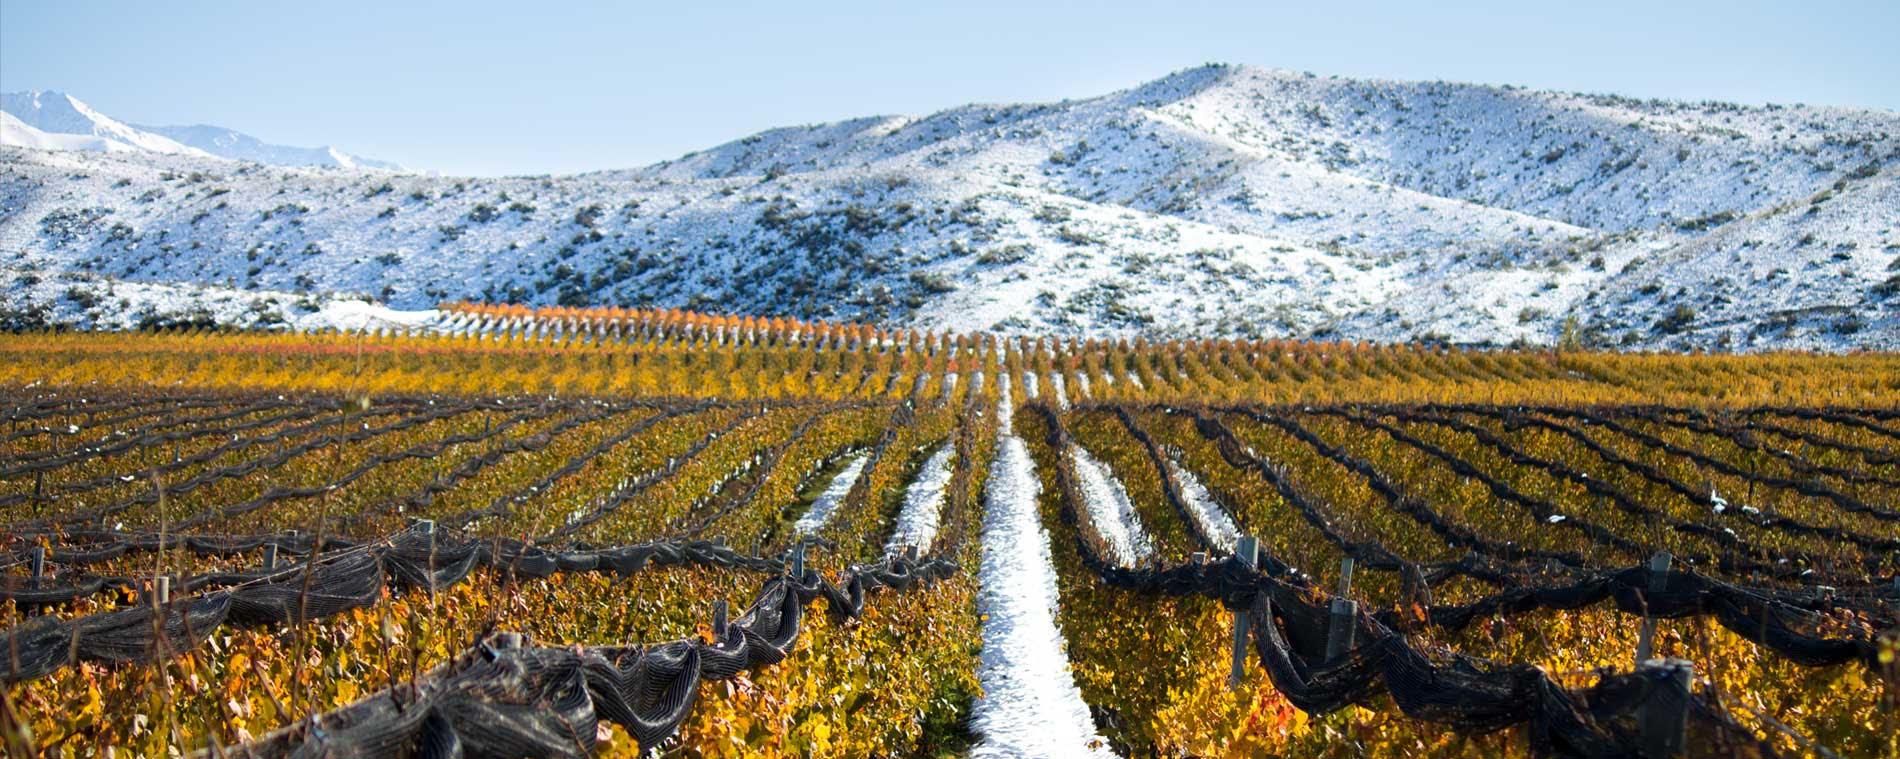 Resultado de imagen para viñedo catena